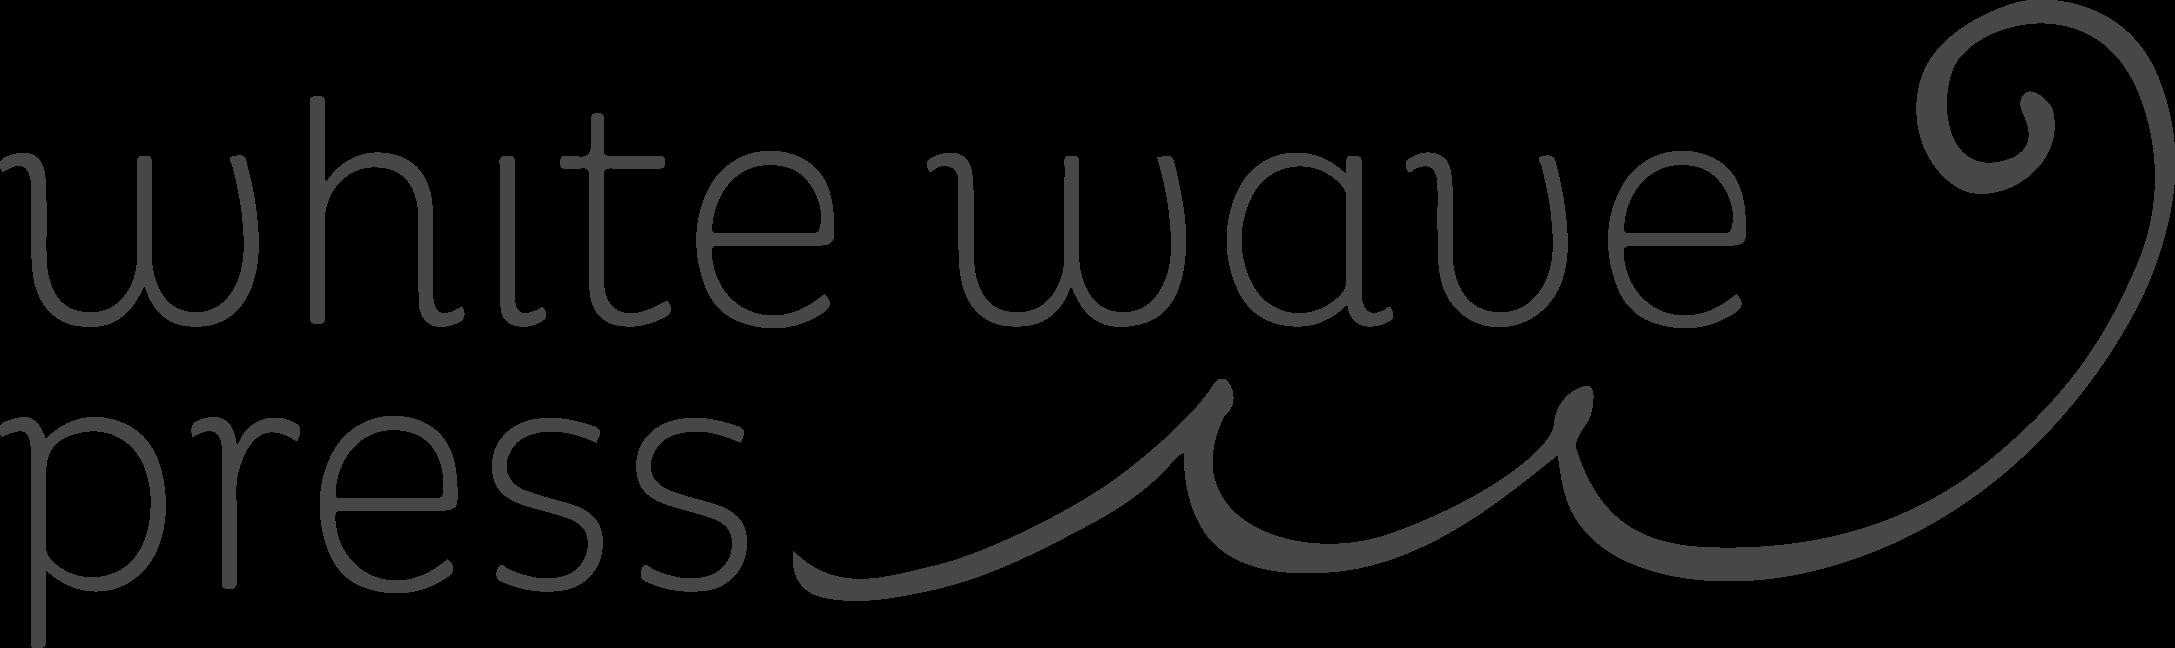 WhiteWavePress_Logo_87k.png